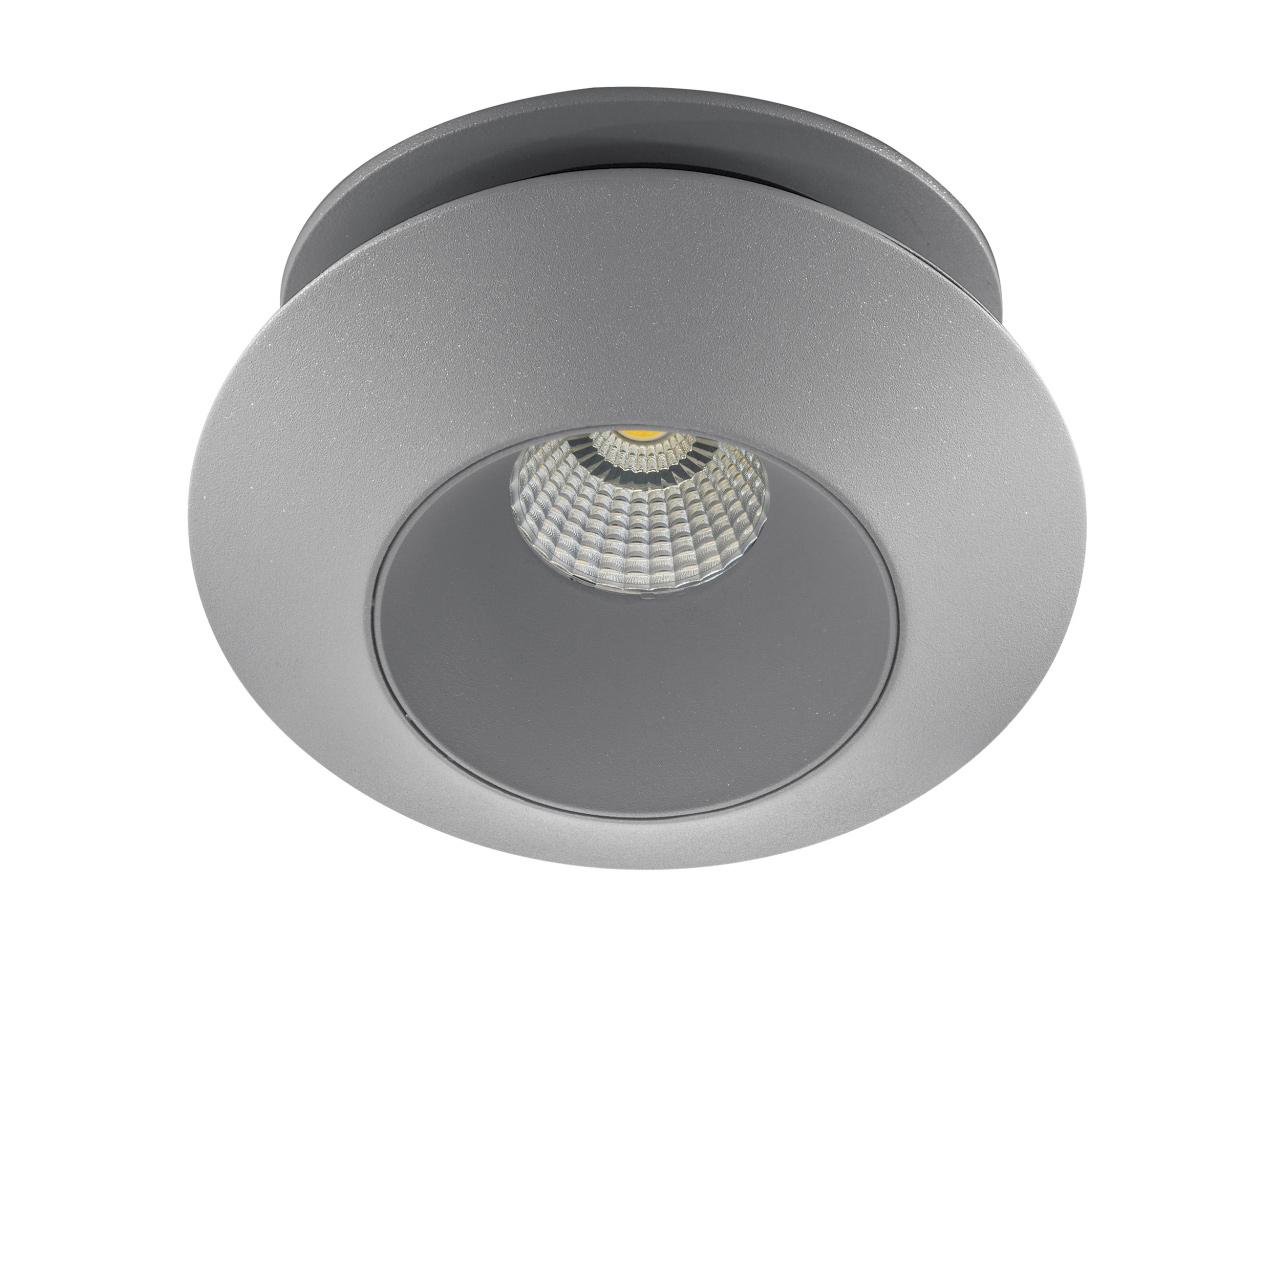 Светильник Orbe LED 15W 1240LM 60G серый 4000K Lightstar 051209